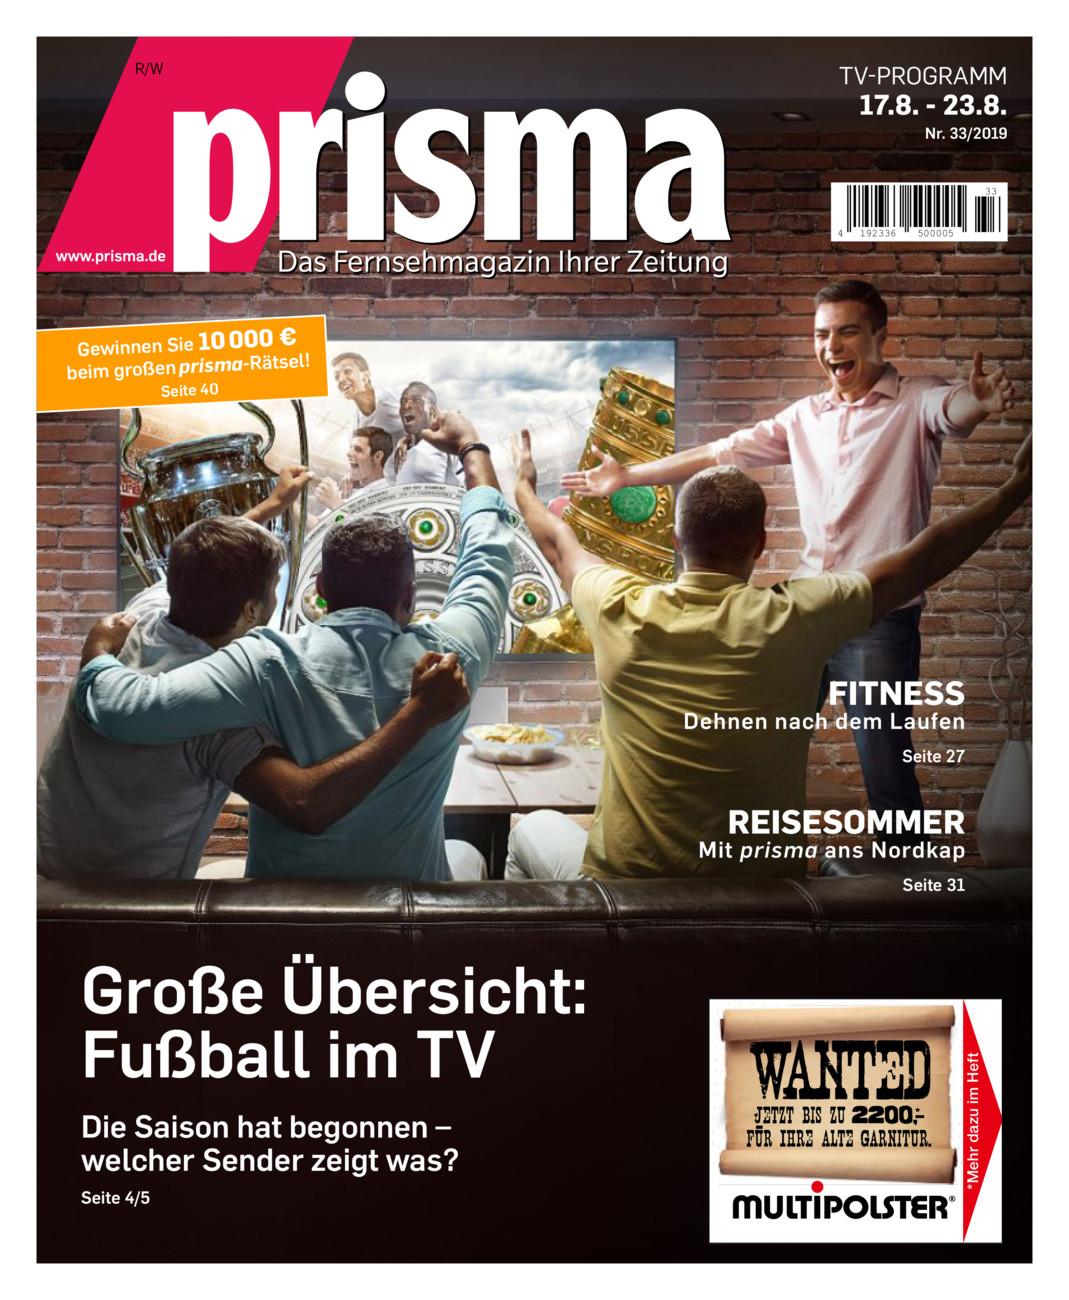 Prisma 17.8. - 23.8.